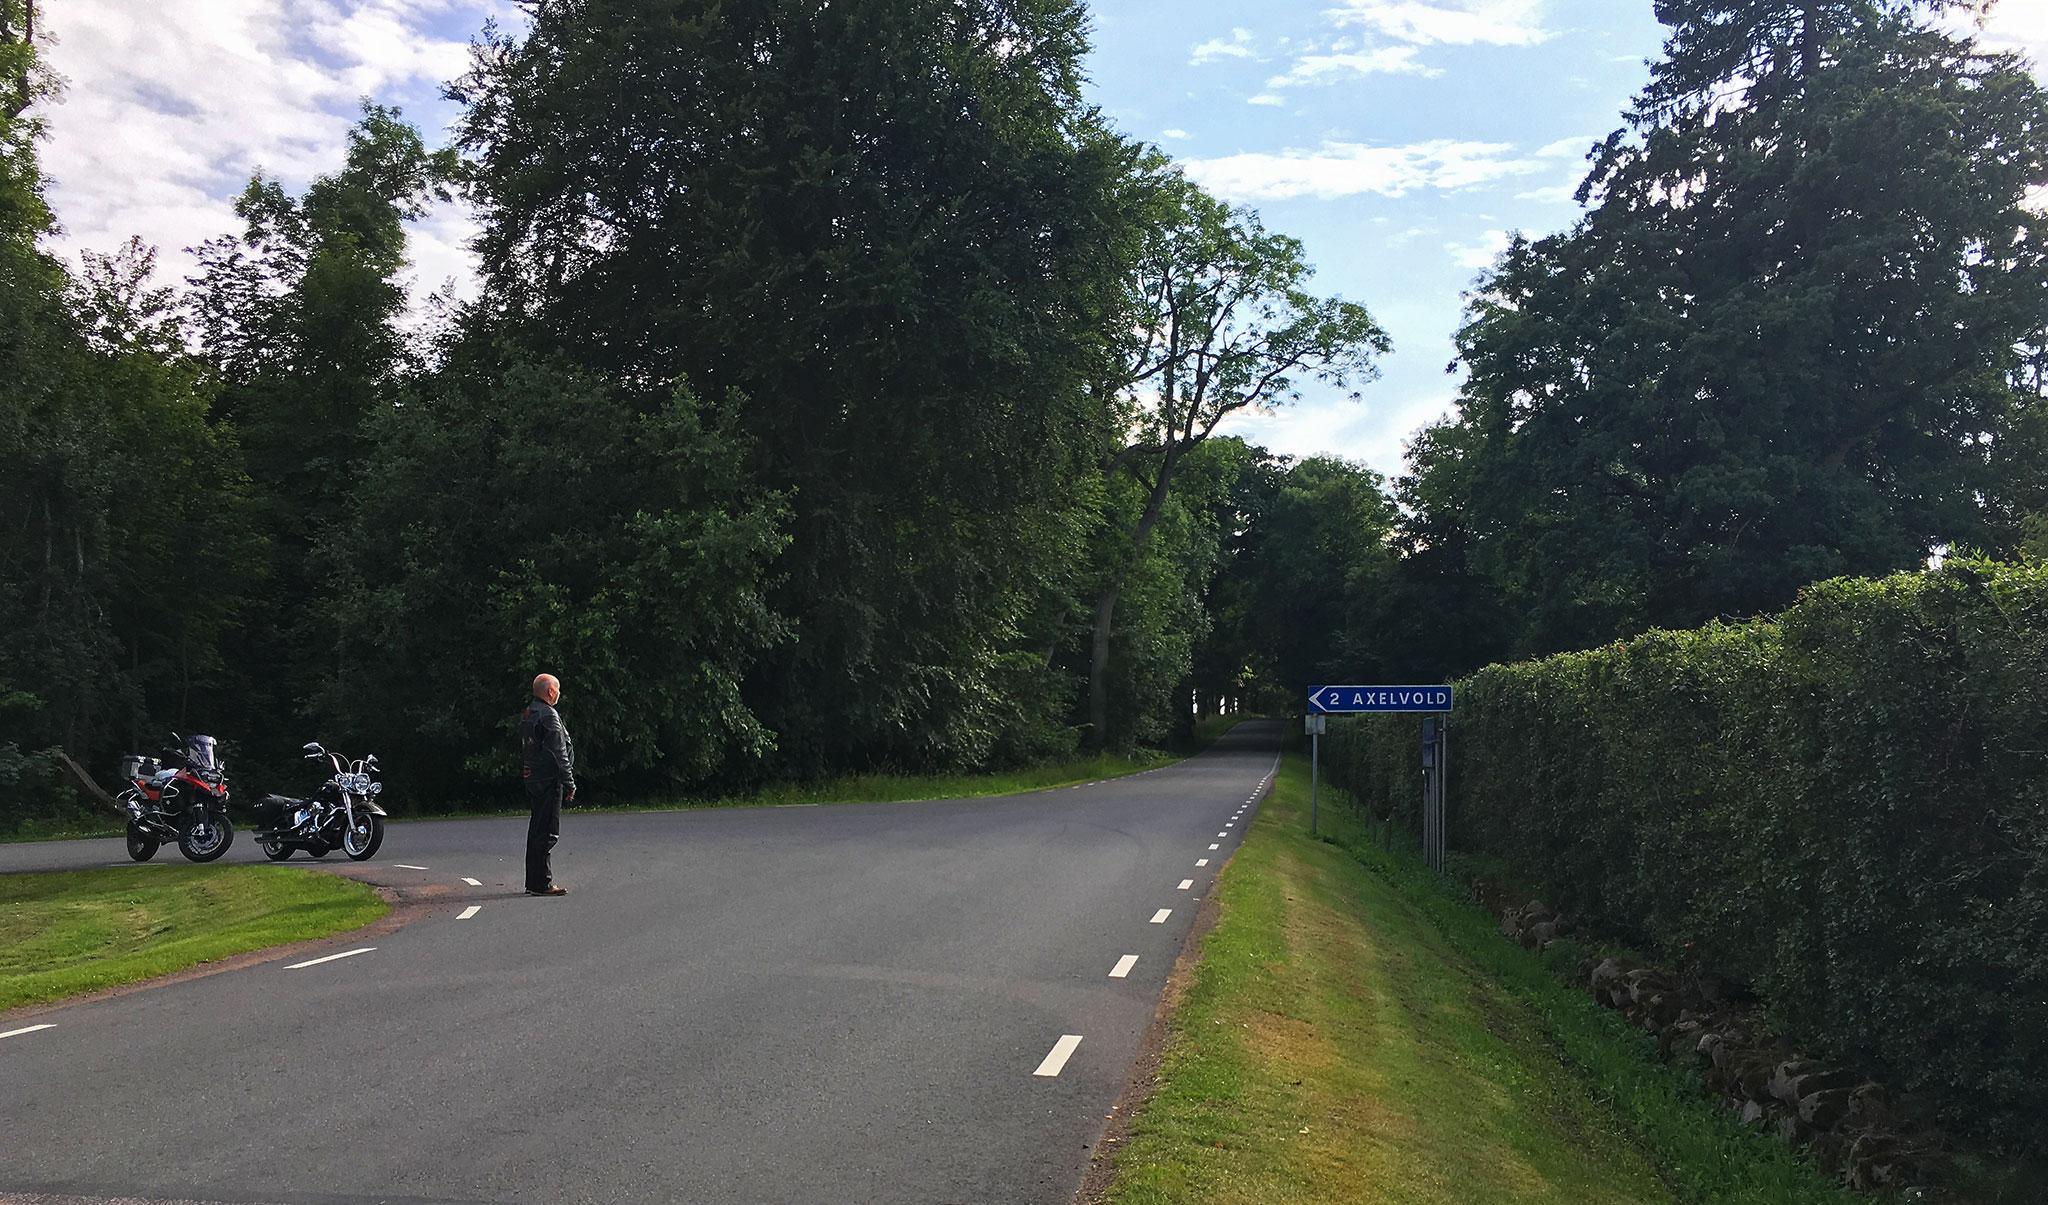 Smallways intersection in Skåne